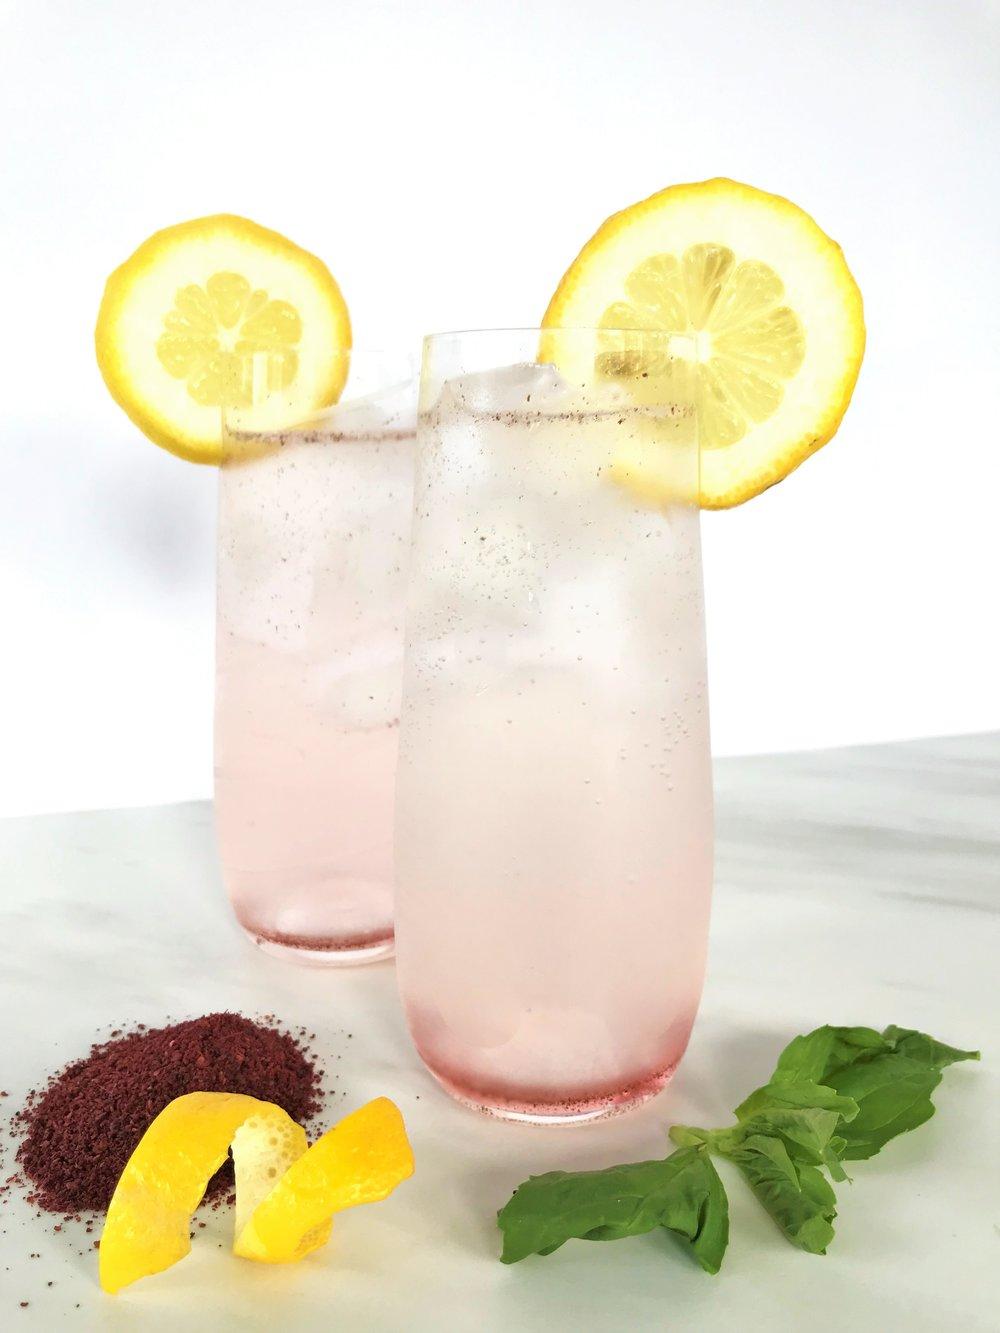 Sumac-Basil Vodka Lemonade Cocktails made in the Adventure Kitchen.